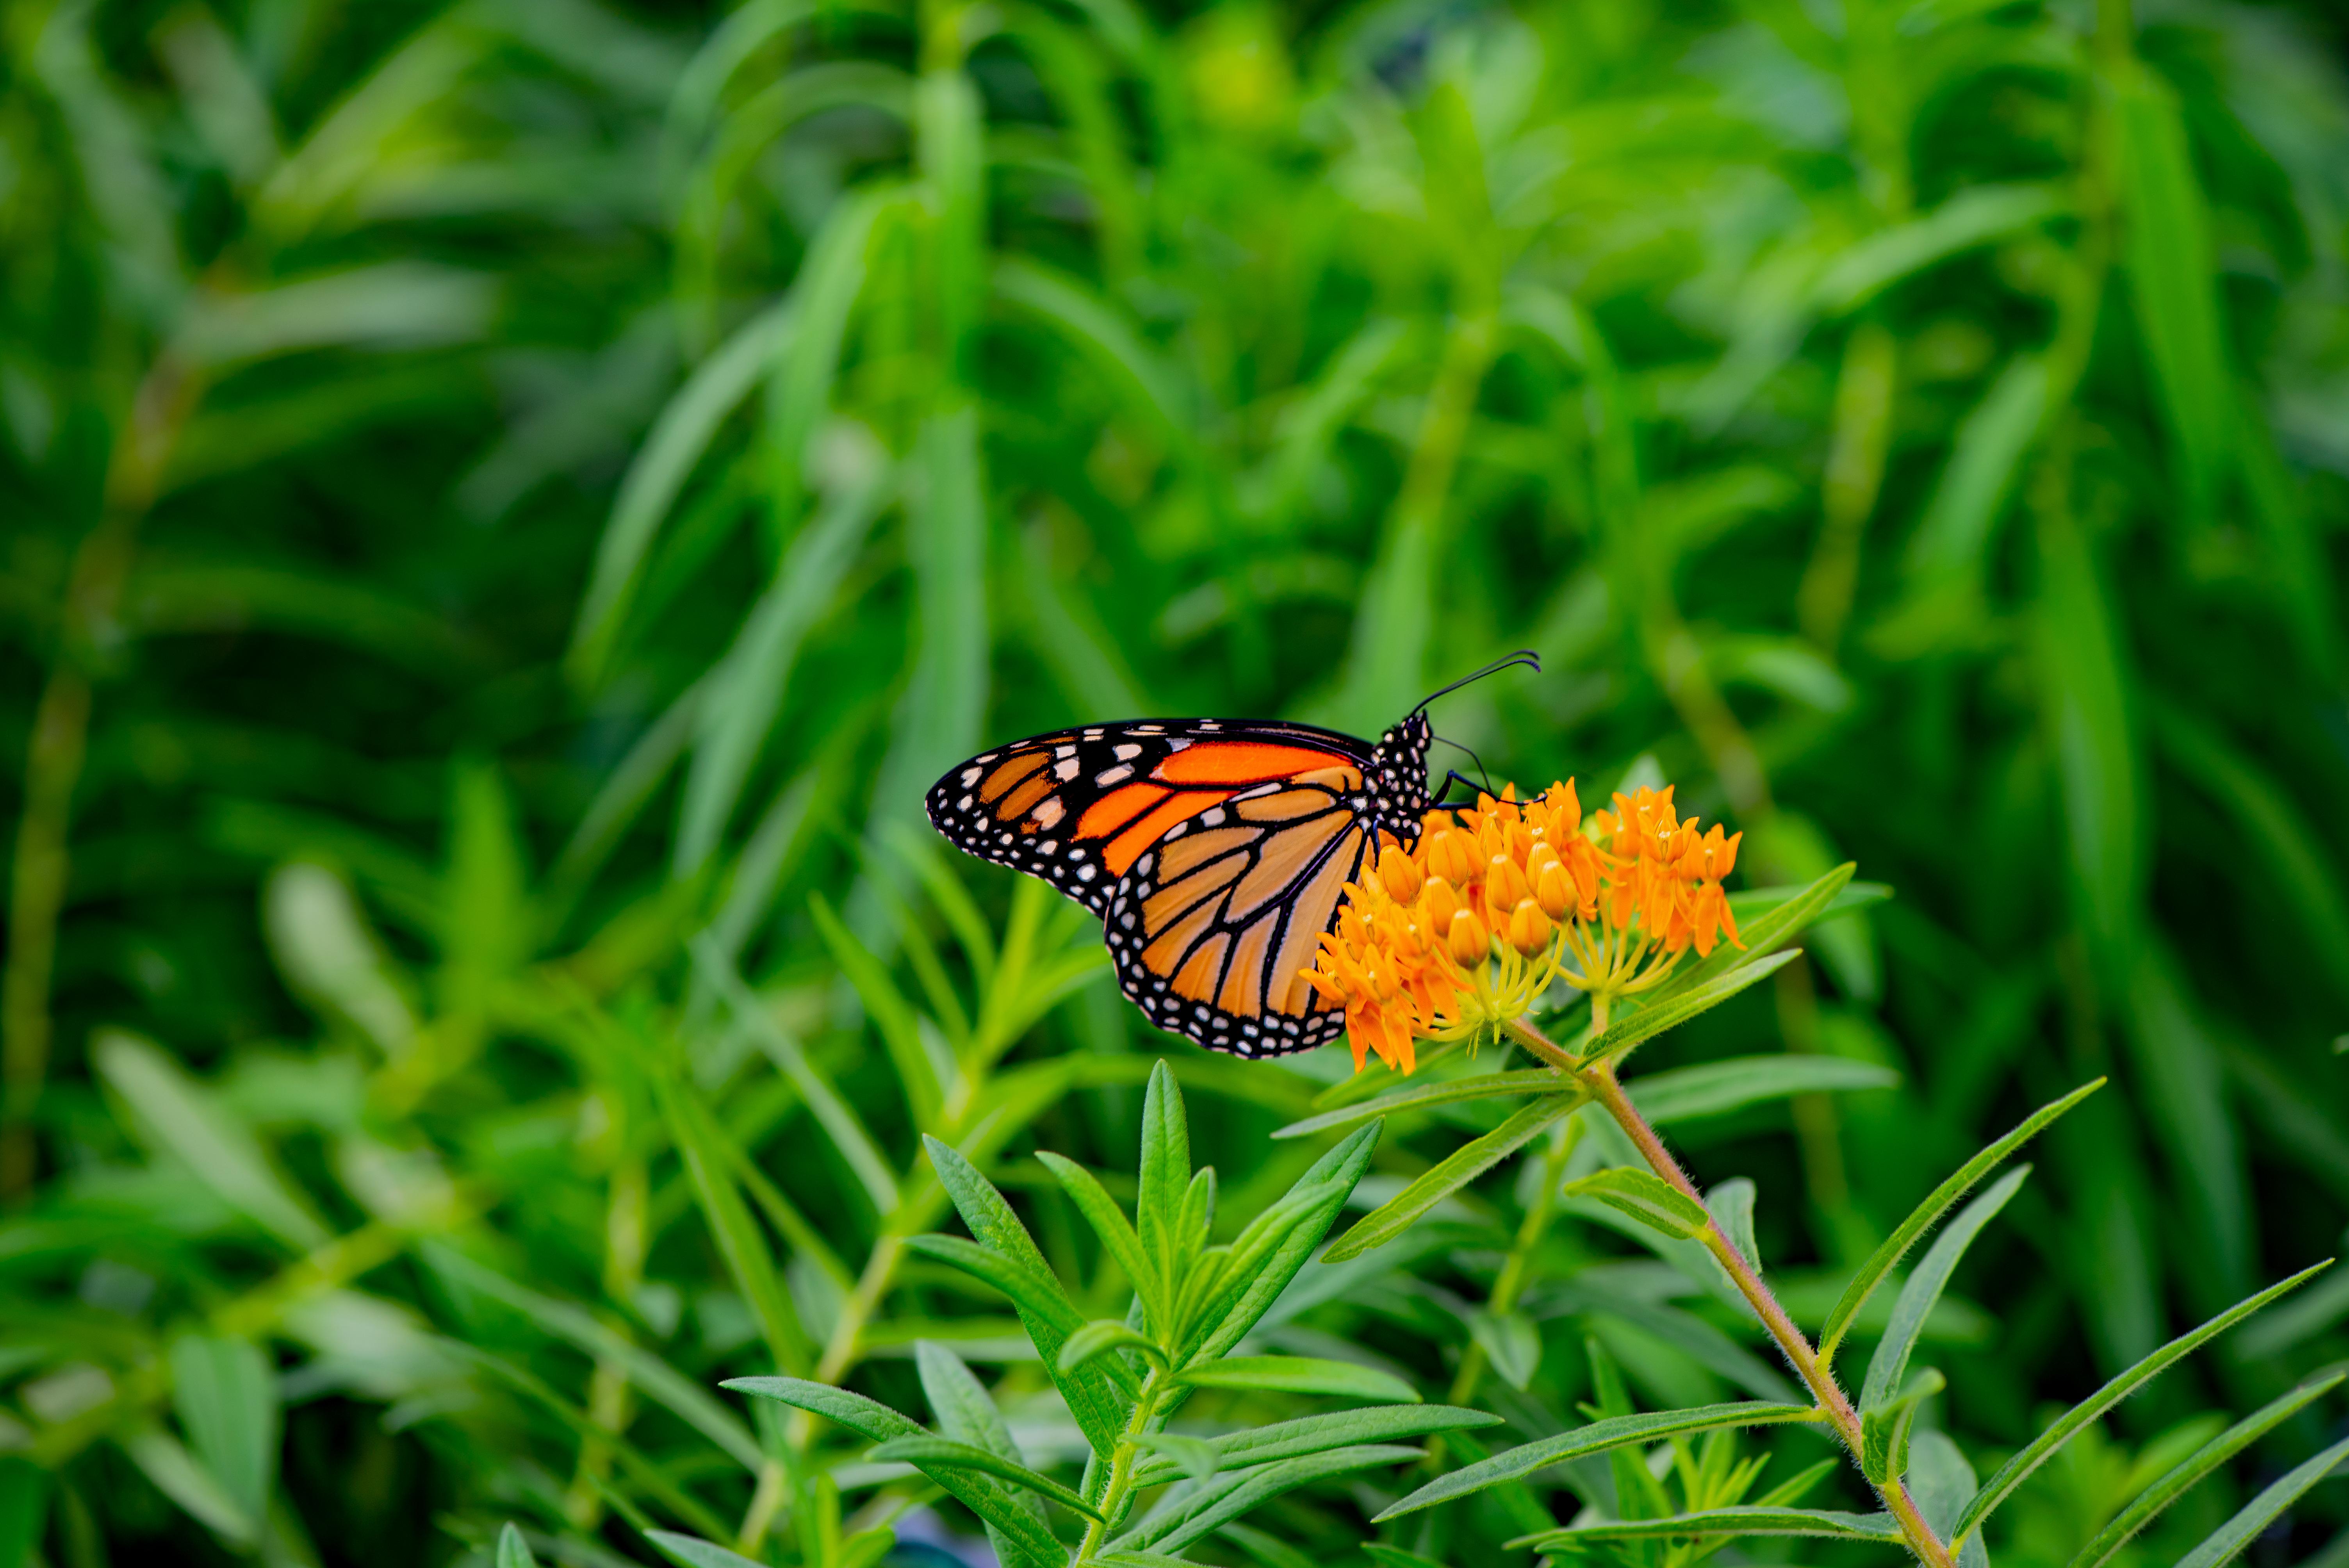 Monarch butterfly on milkweed, Asclepias tuberosa